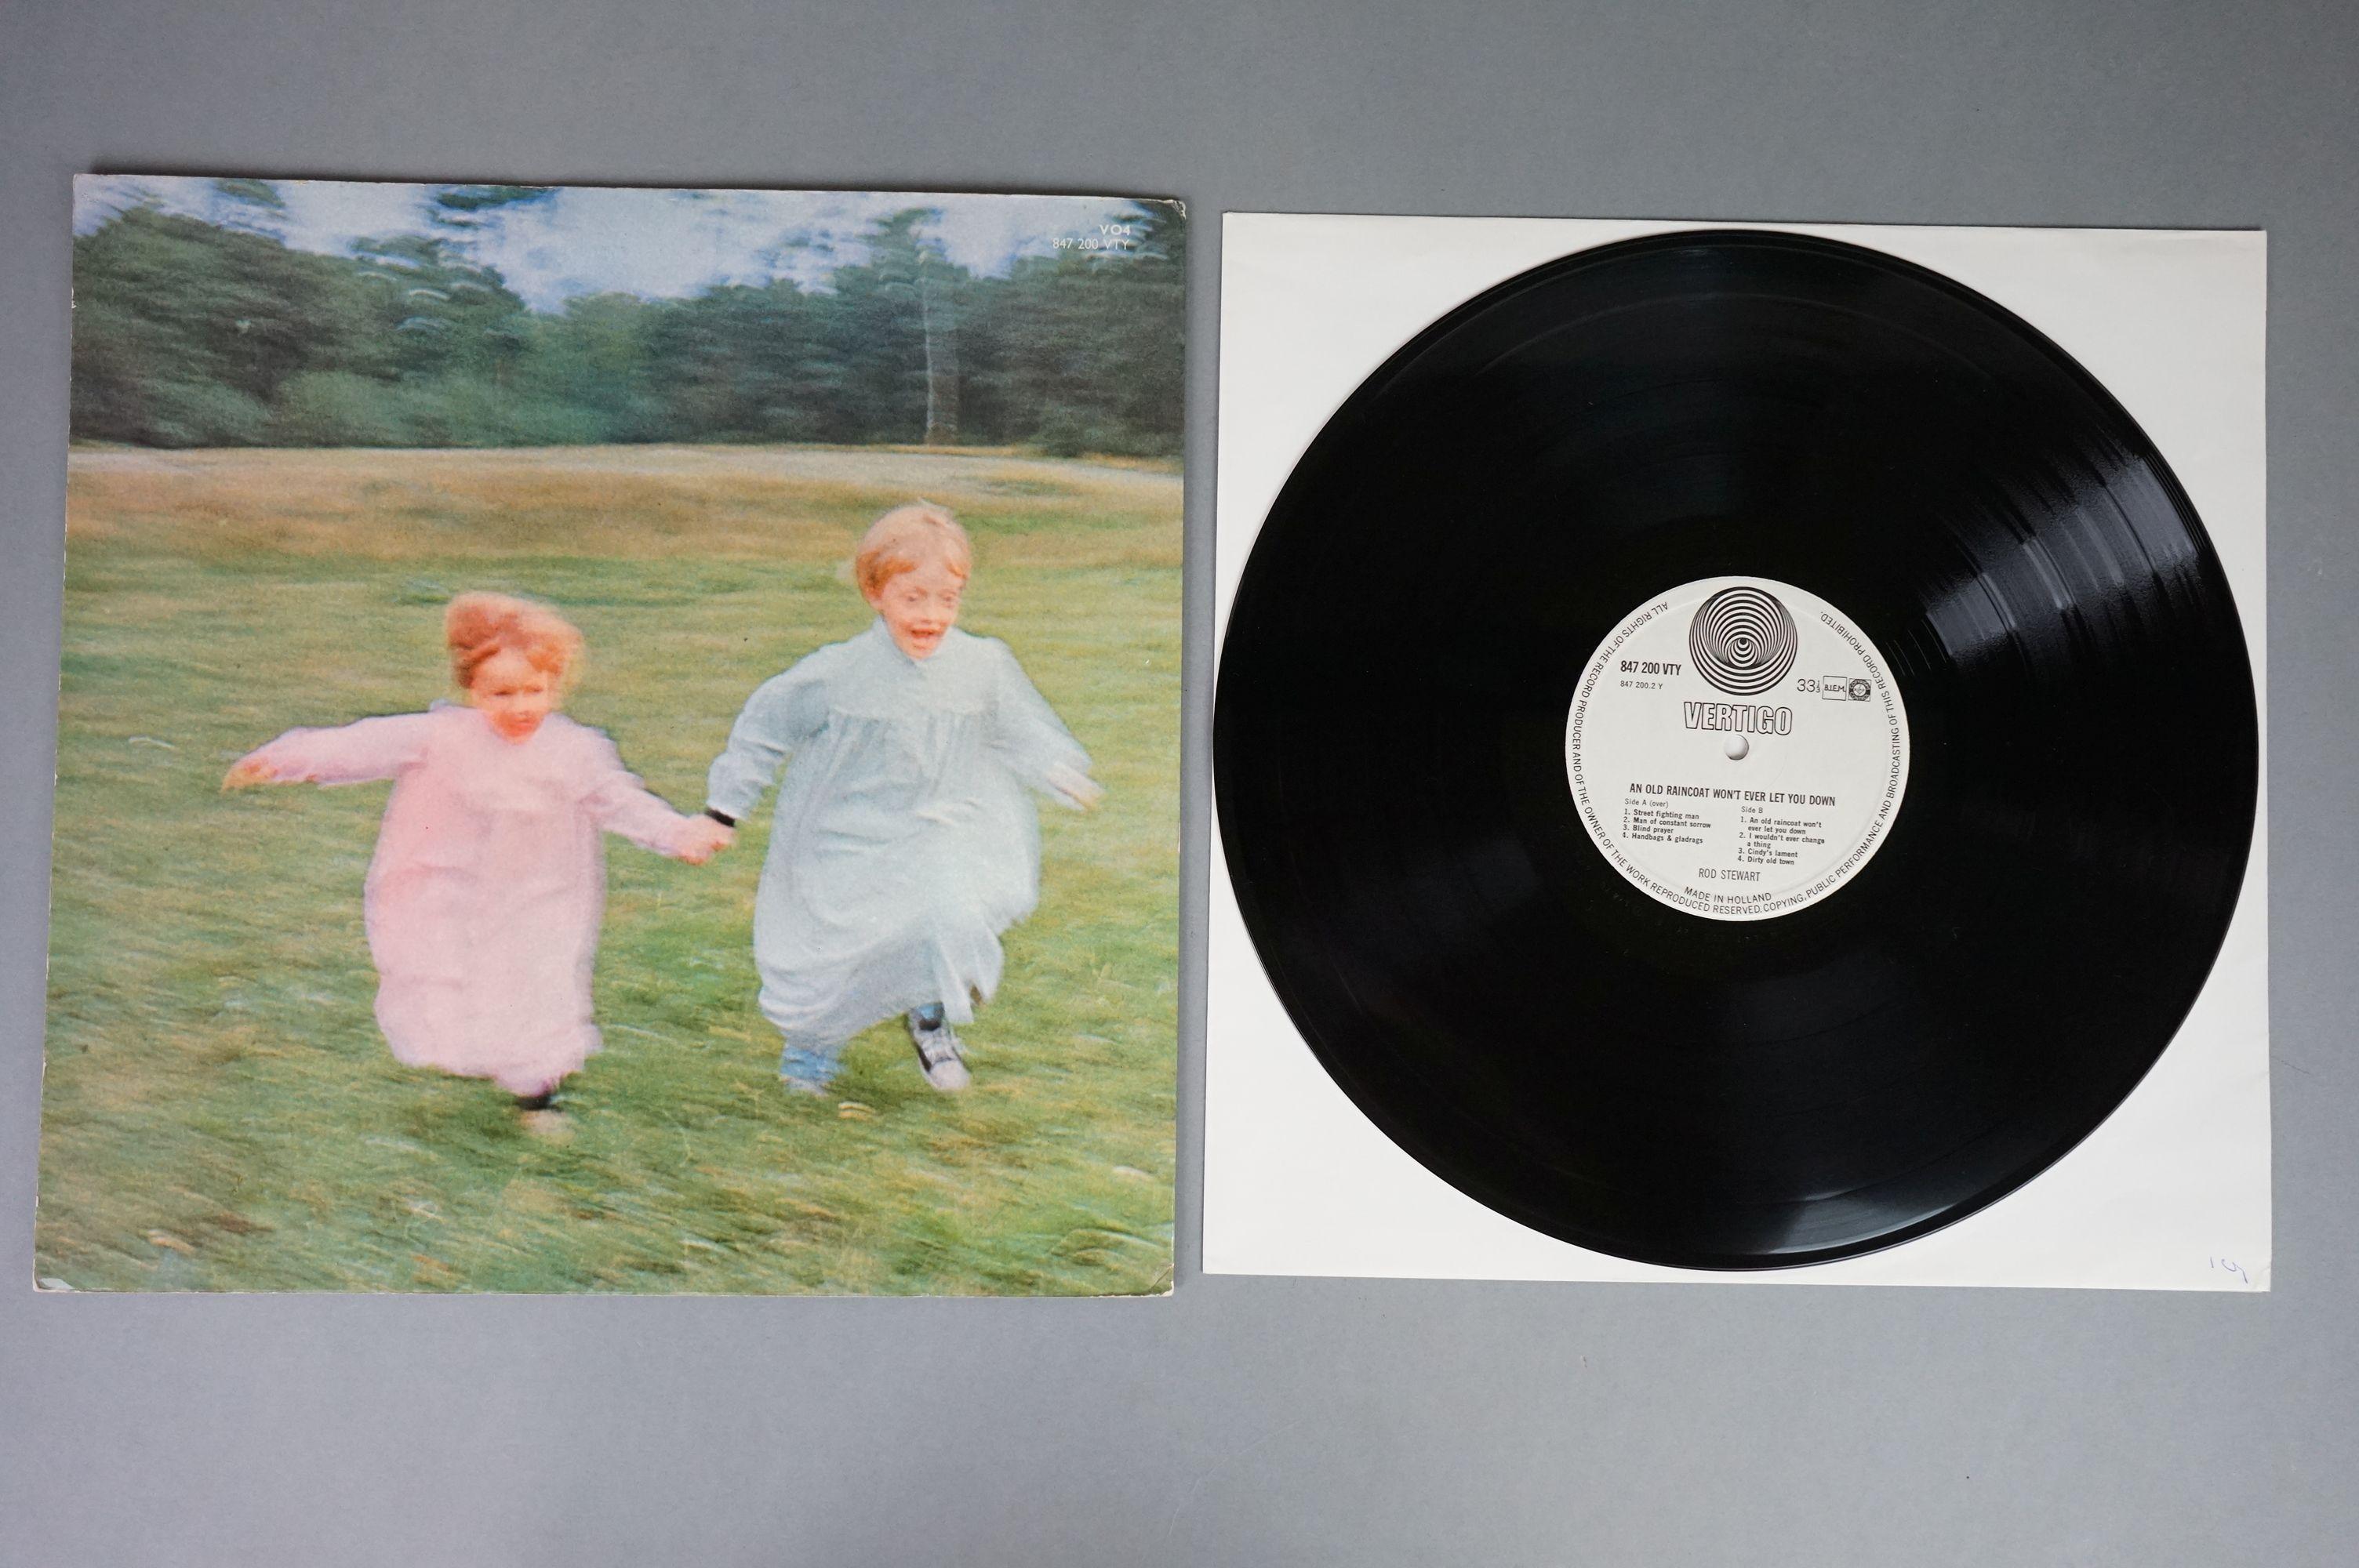 Vinyl - Rod Stewart 4 LP's to include An Old Raincoat Won't Ever Let You Down (Vertigo VO4) gatefold - Image 13 of 14